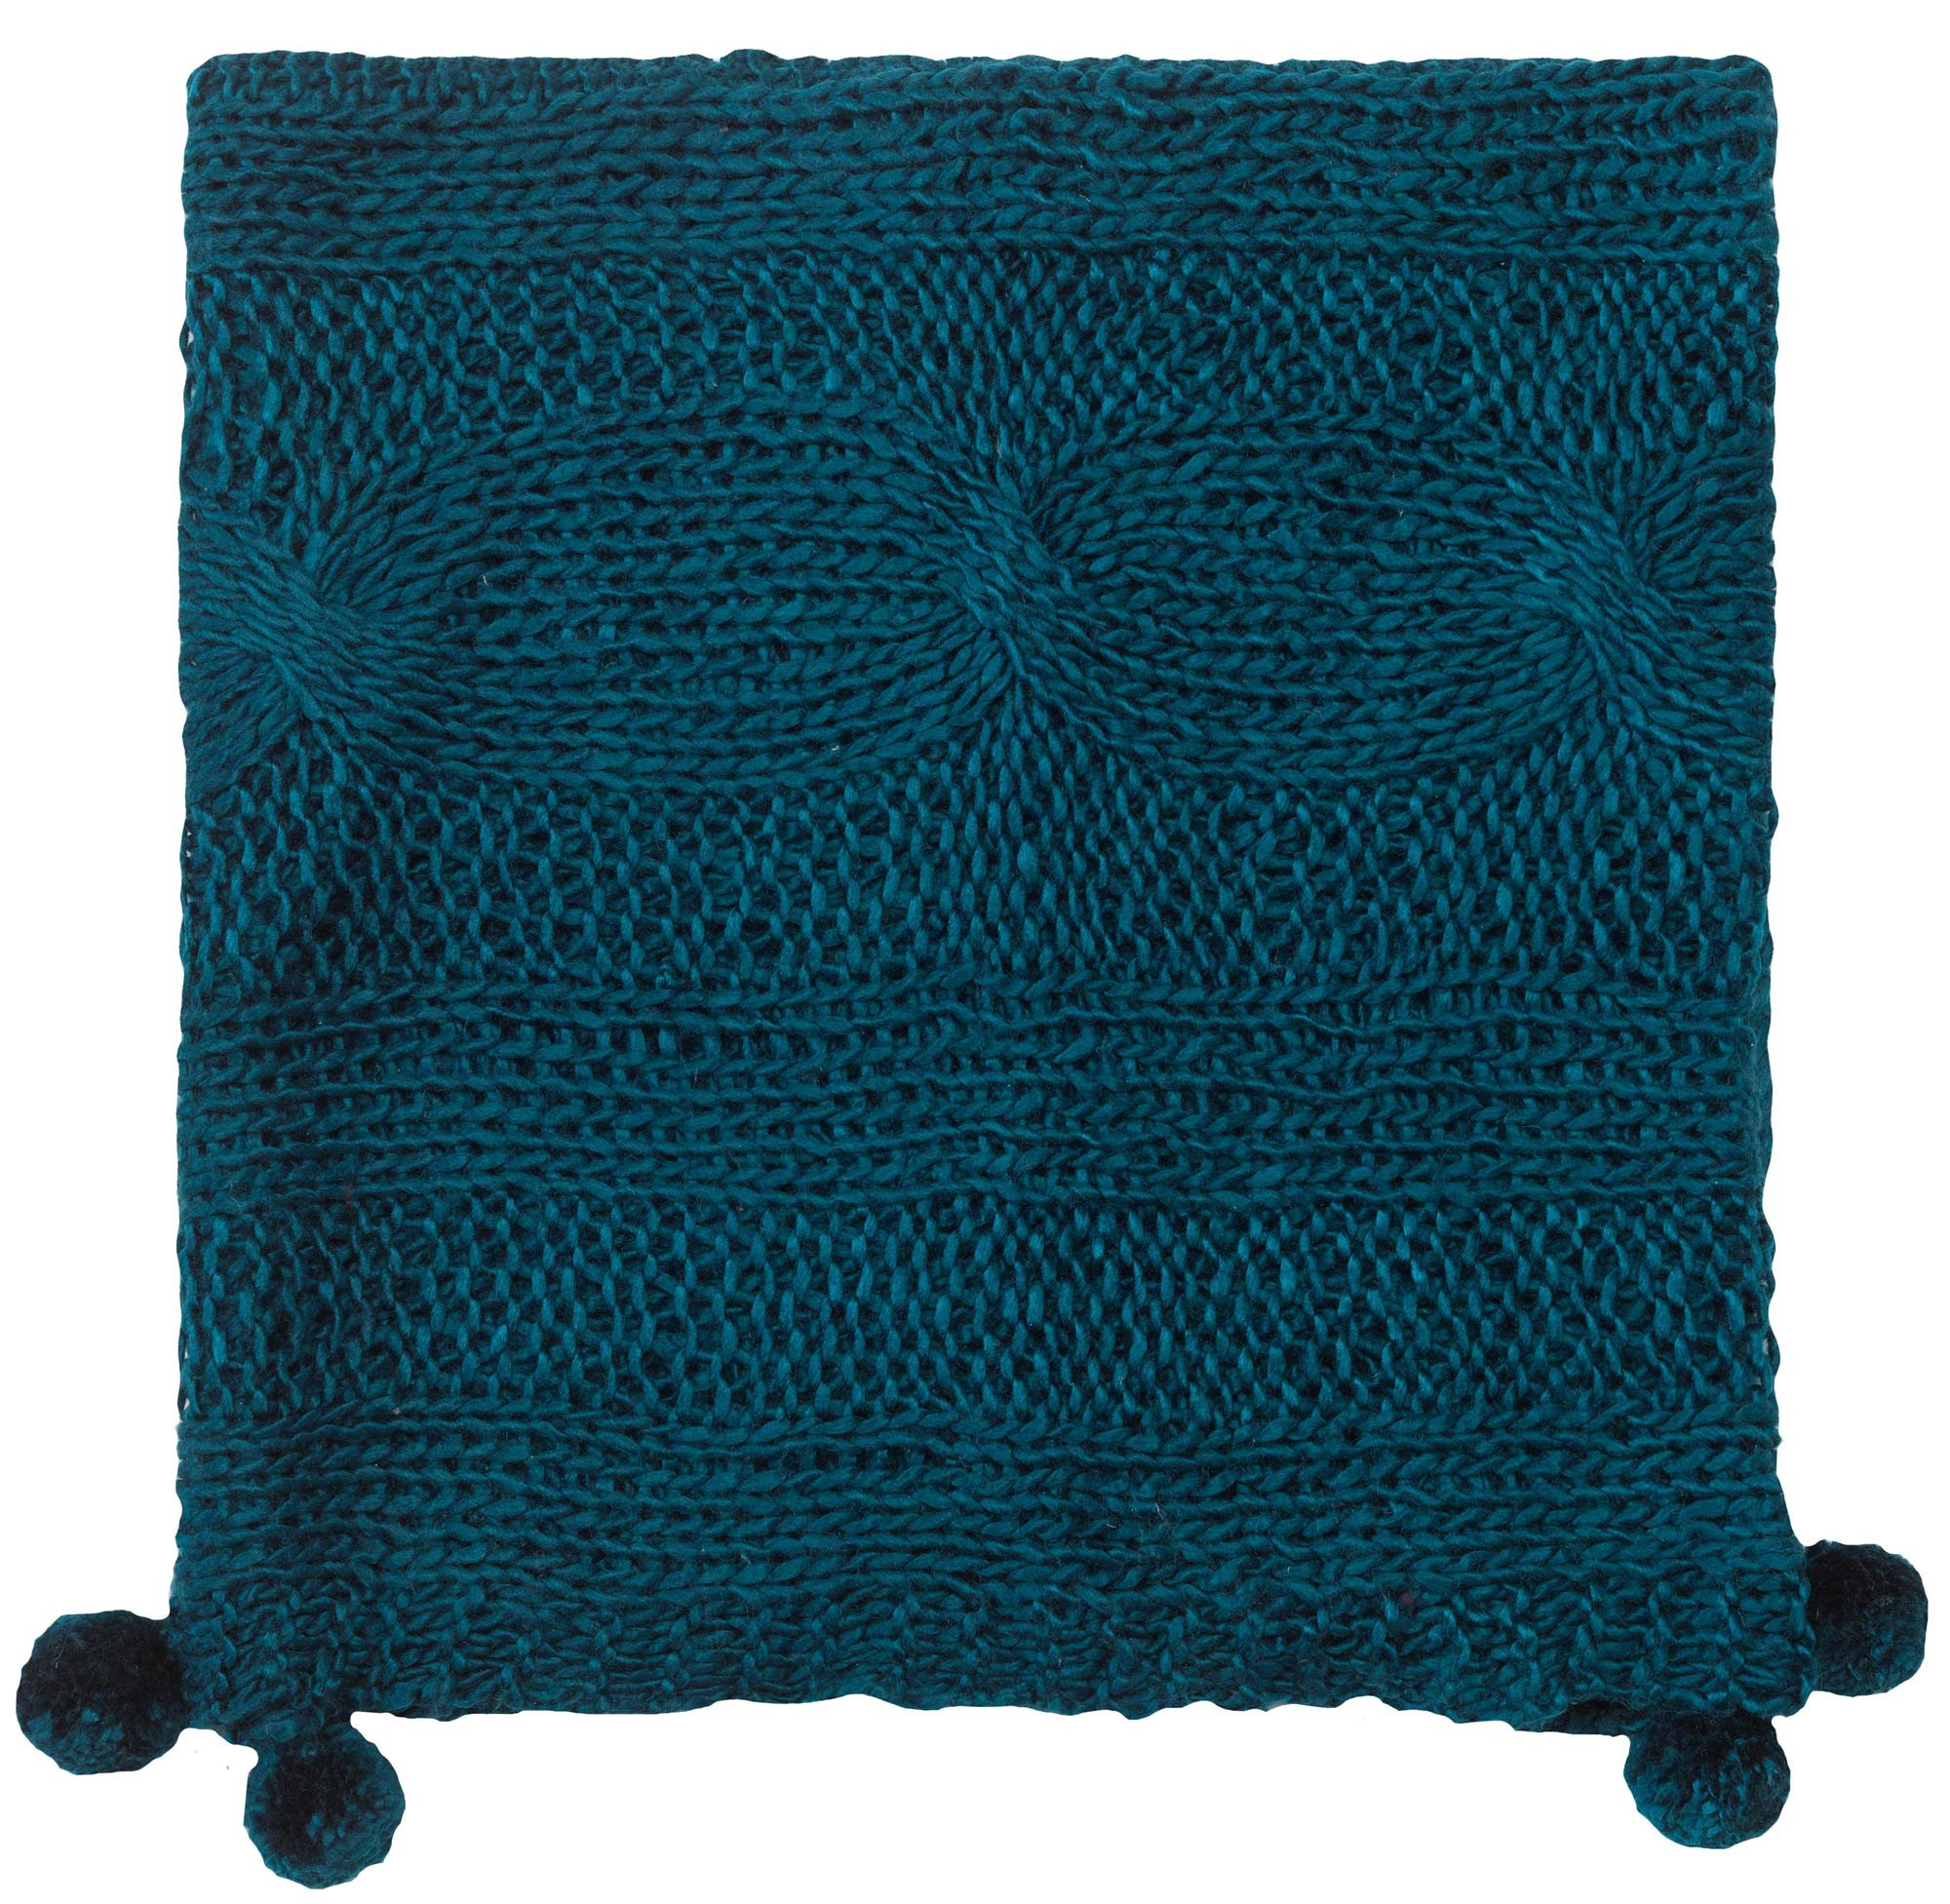 Company C Felicity Throw Blanket, 0, Teal